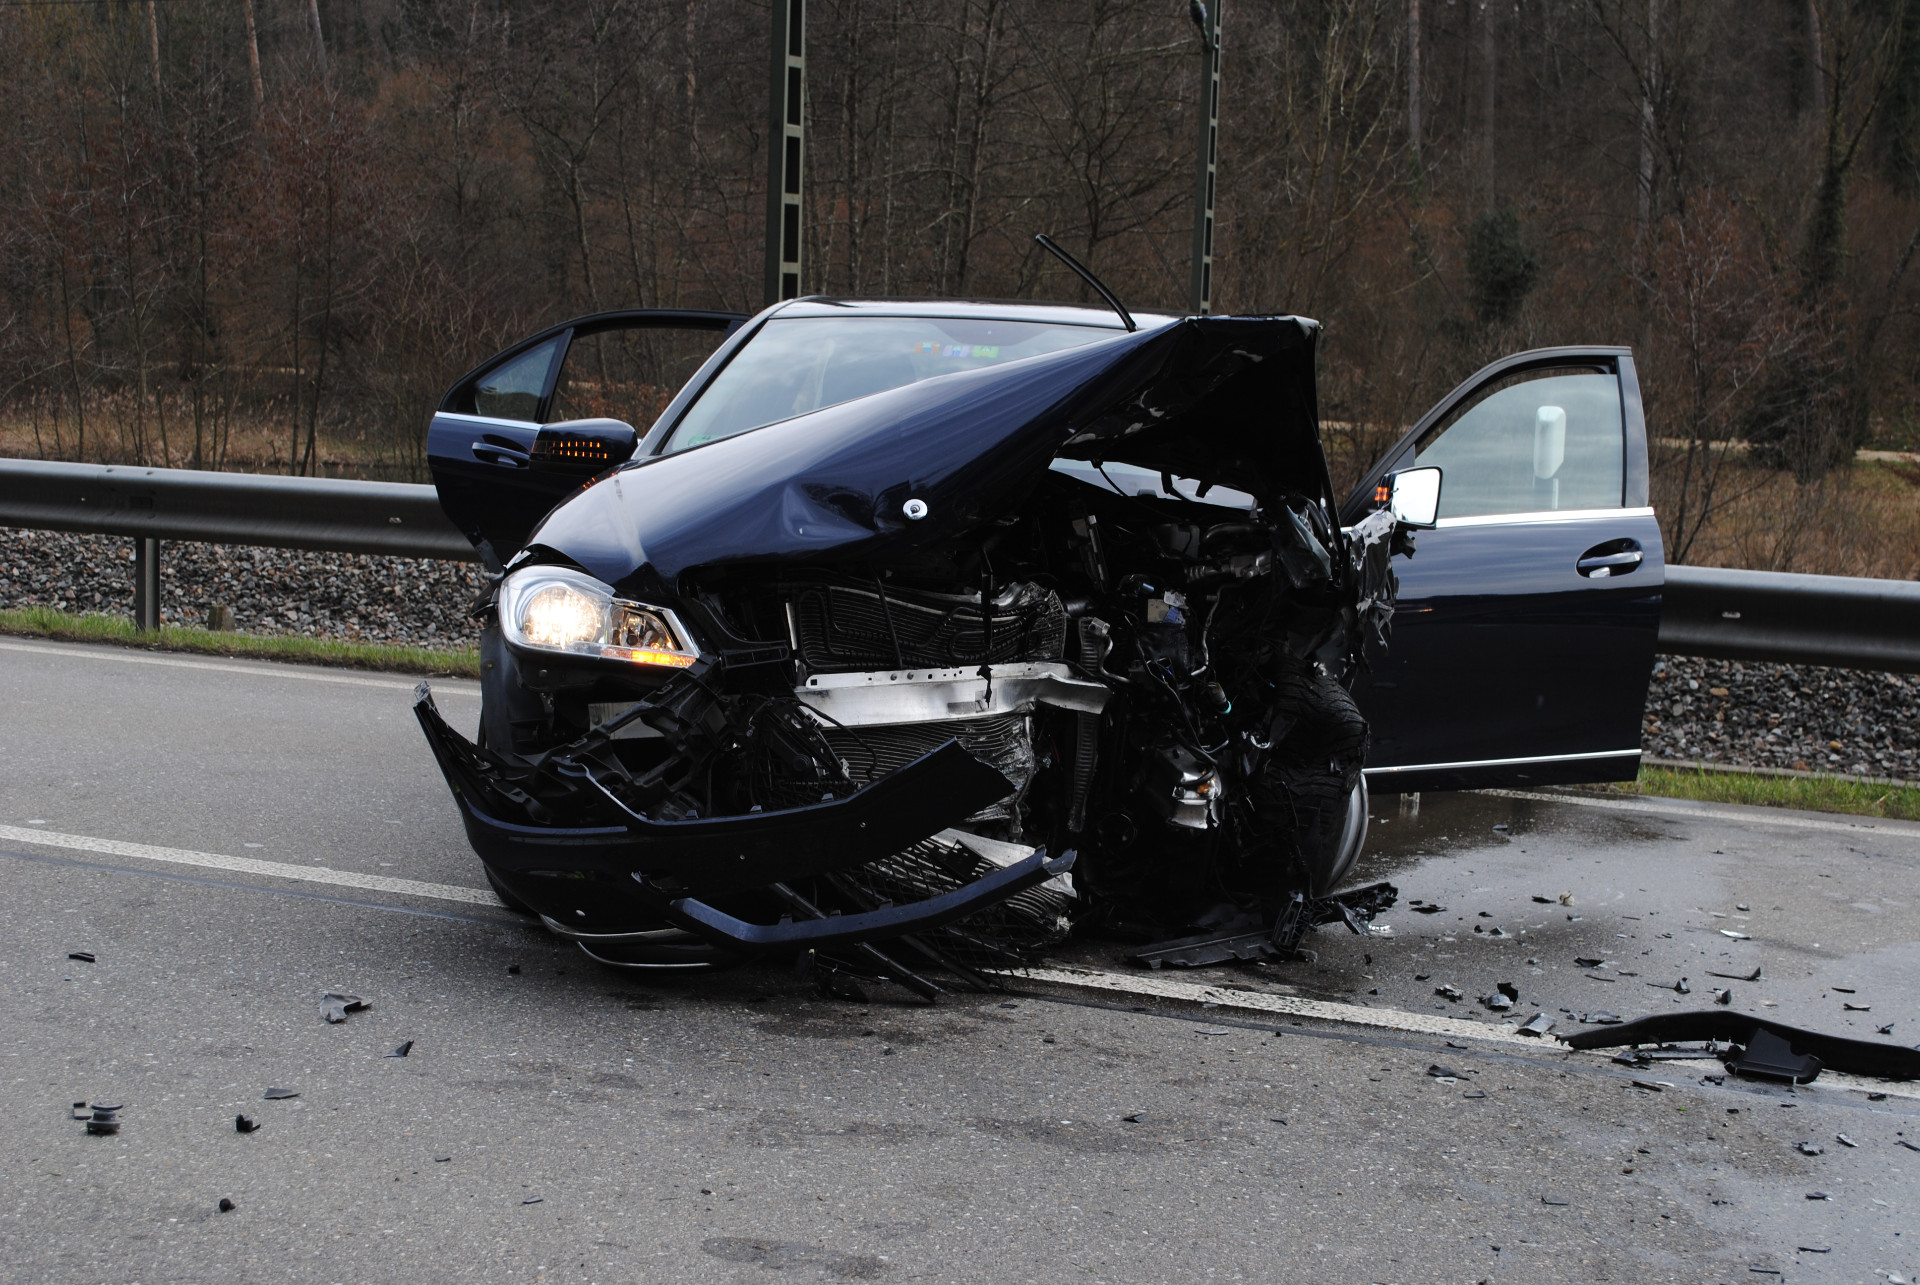 Erneut schwerer Verkehrsunfall auf der J15 | Schaffhauser Nachrichten